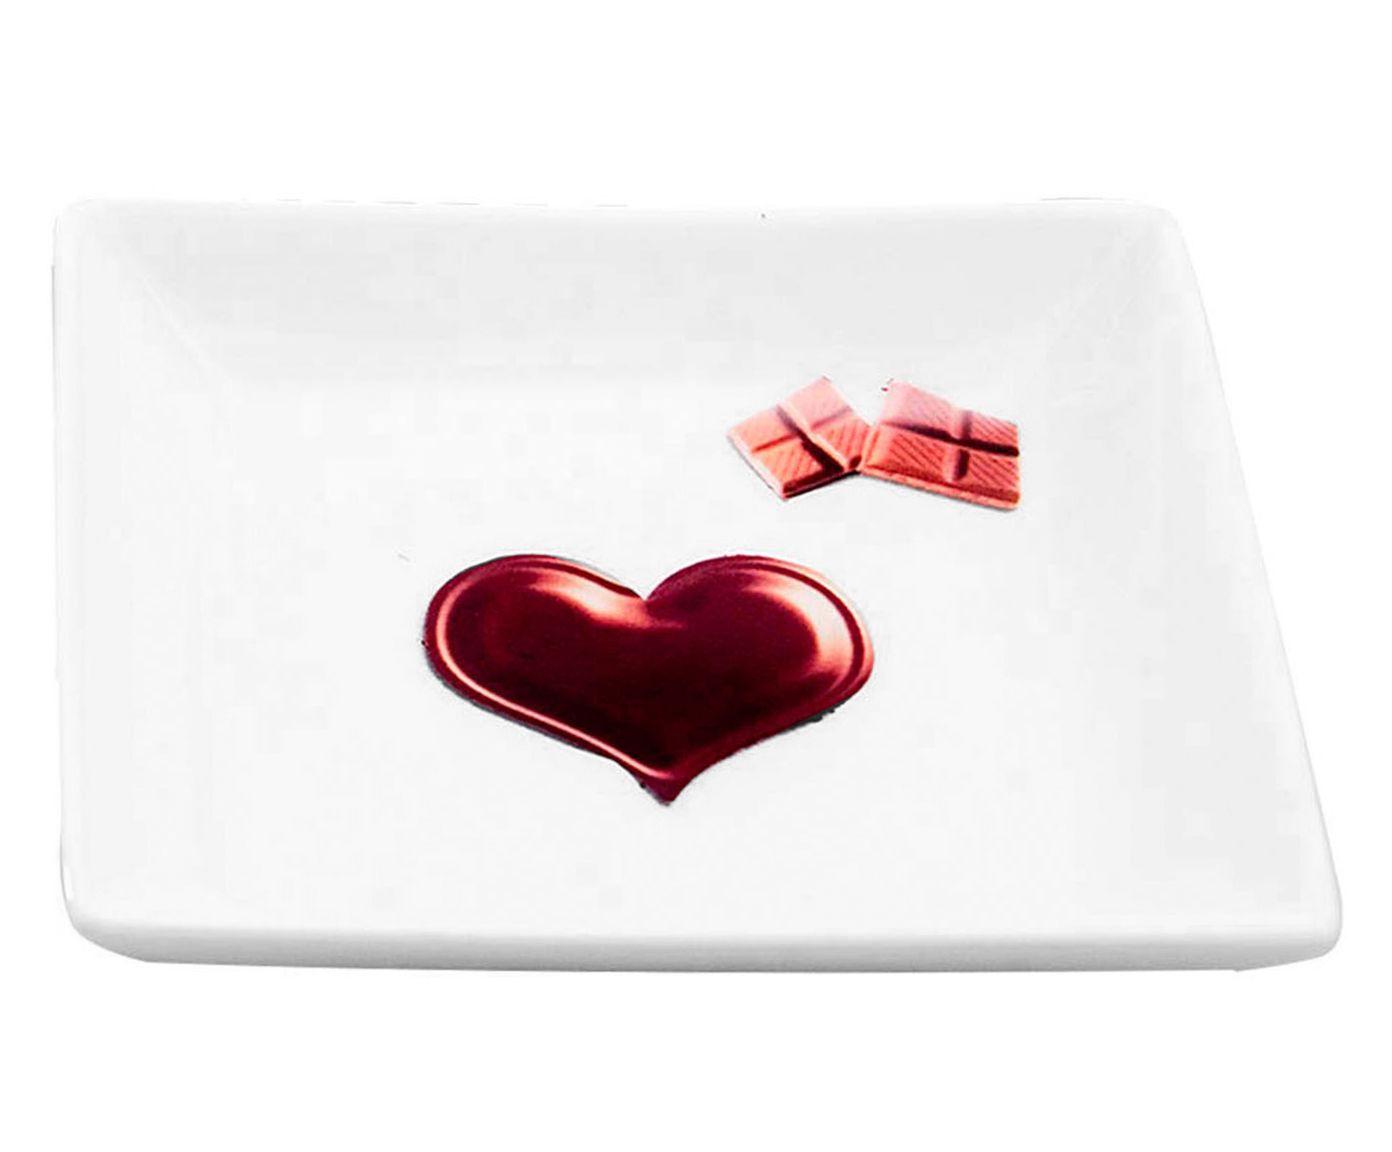 Petisqueira Heart & Chocolats | Westwing.com.br